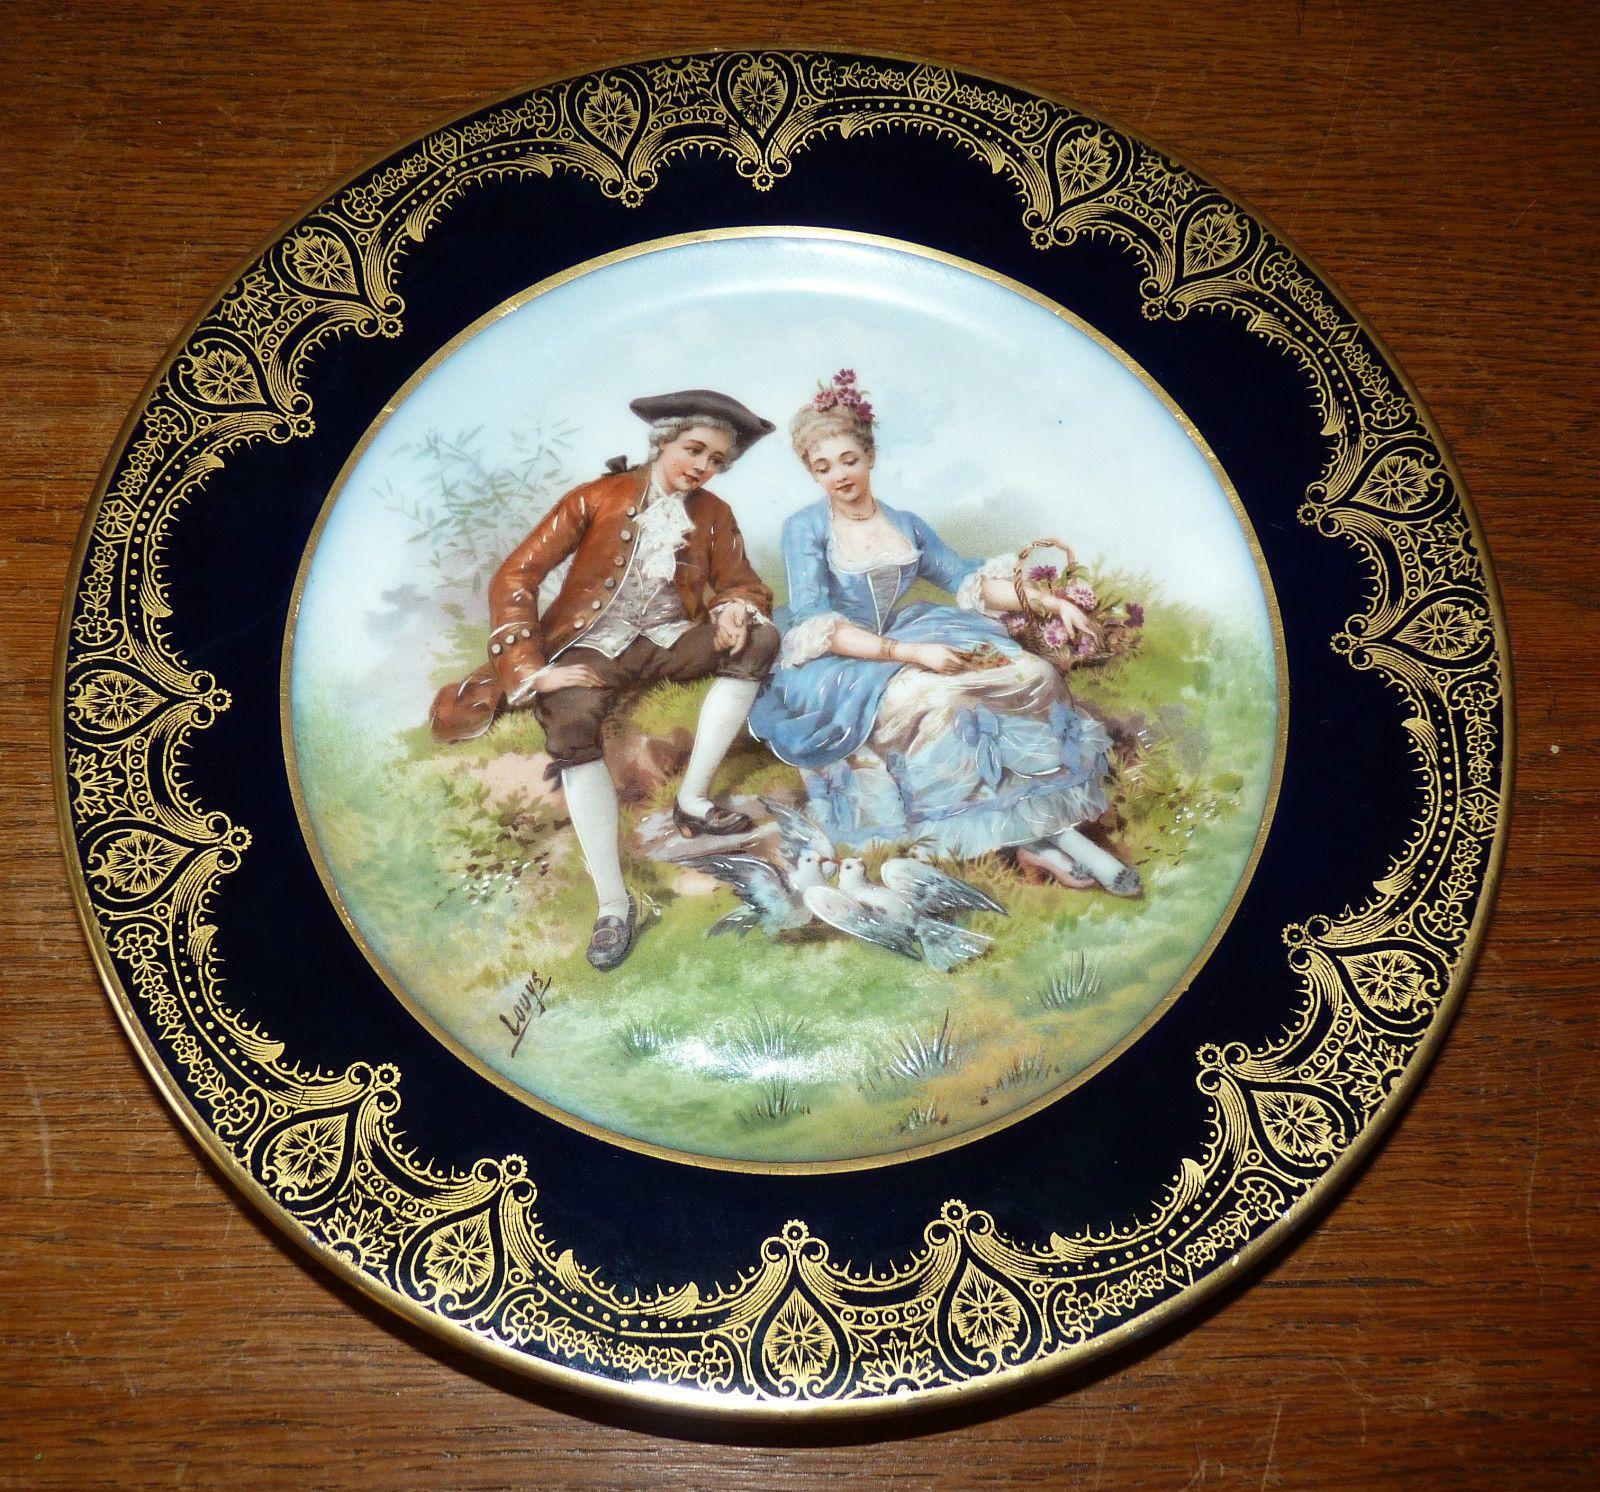 Limoges Porcelain Plate Signed Of Louys Bd Limoges Blue Four Of And Gold Ebay Limoges Porcelain Plates Limoges Porcelain Plates